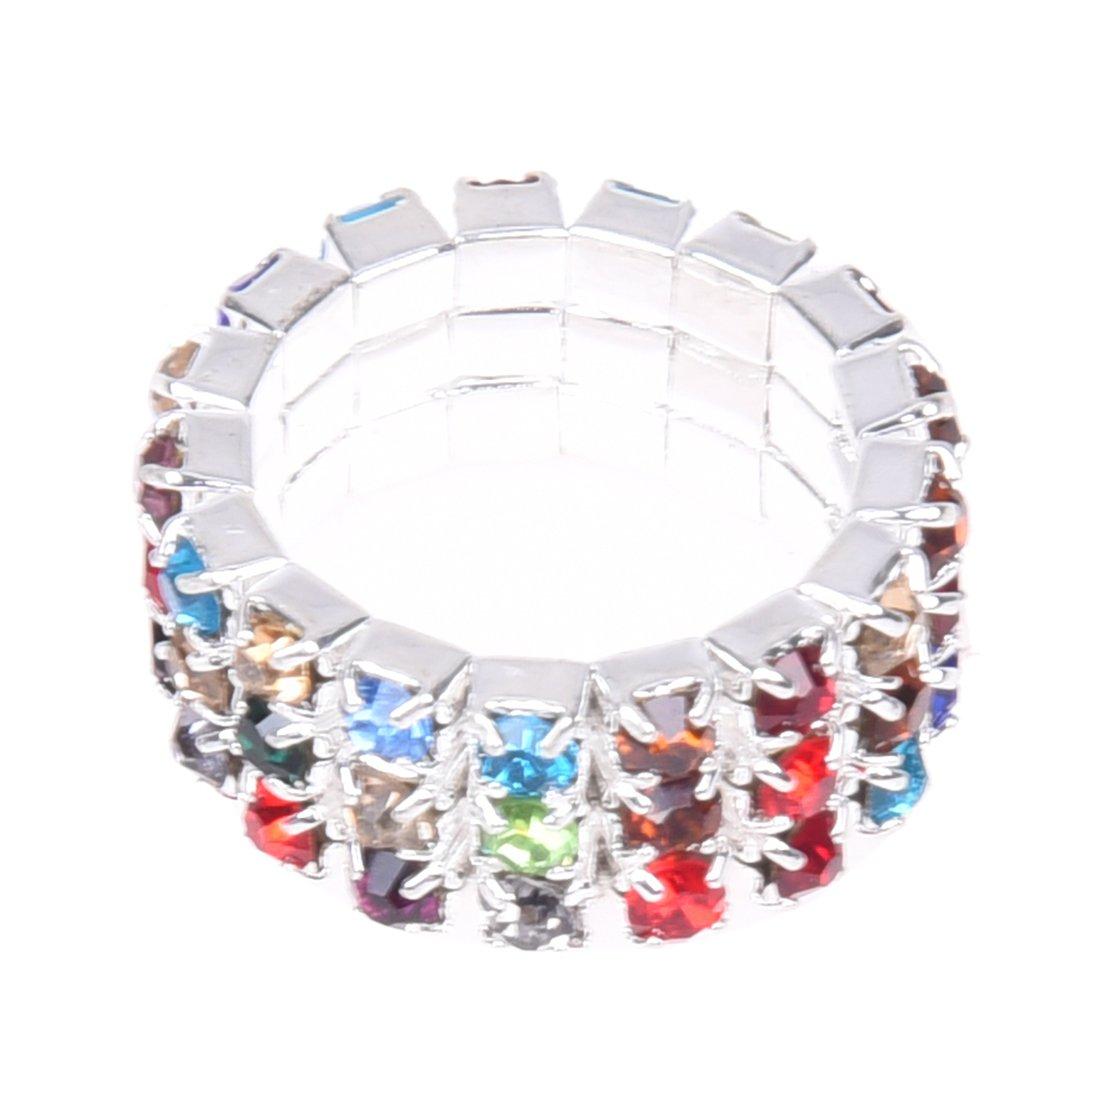 SODIAL(R) 9mm Elastic Multicolor 3 Row Rhinestone Toe Ring Bridal Jewelry